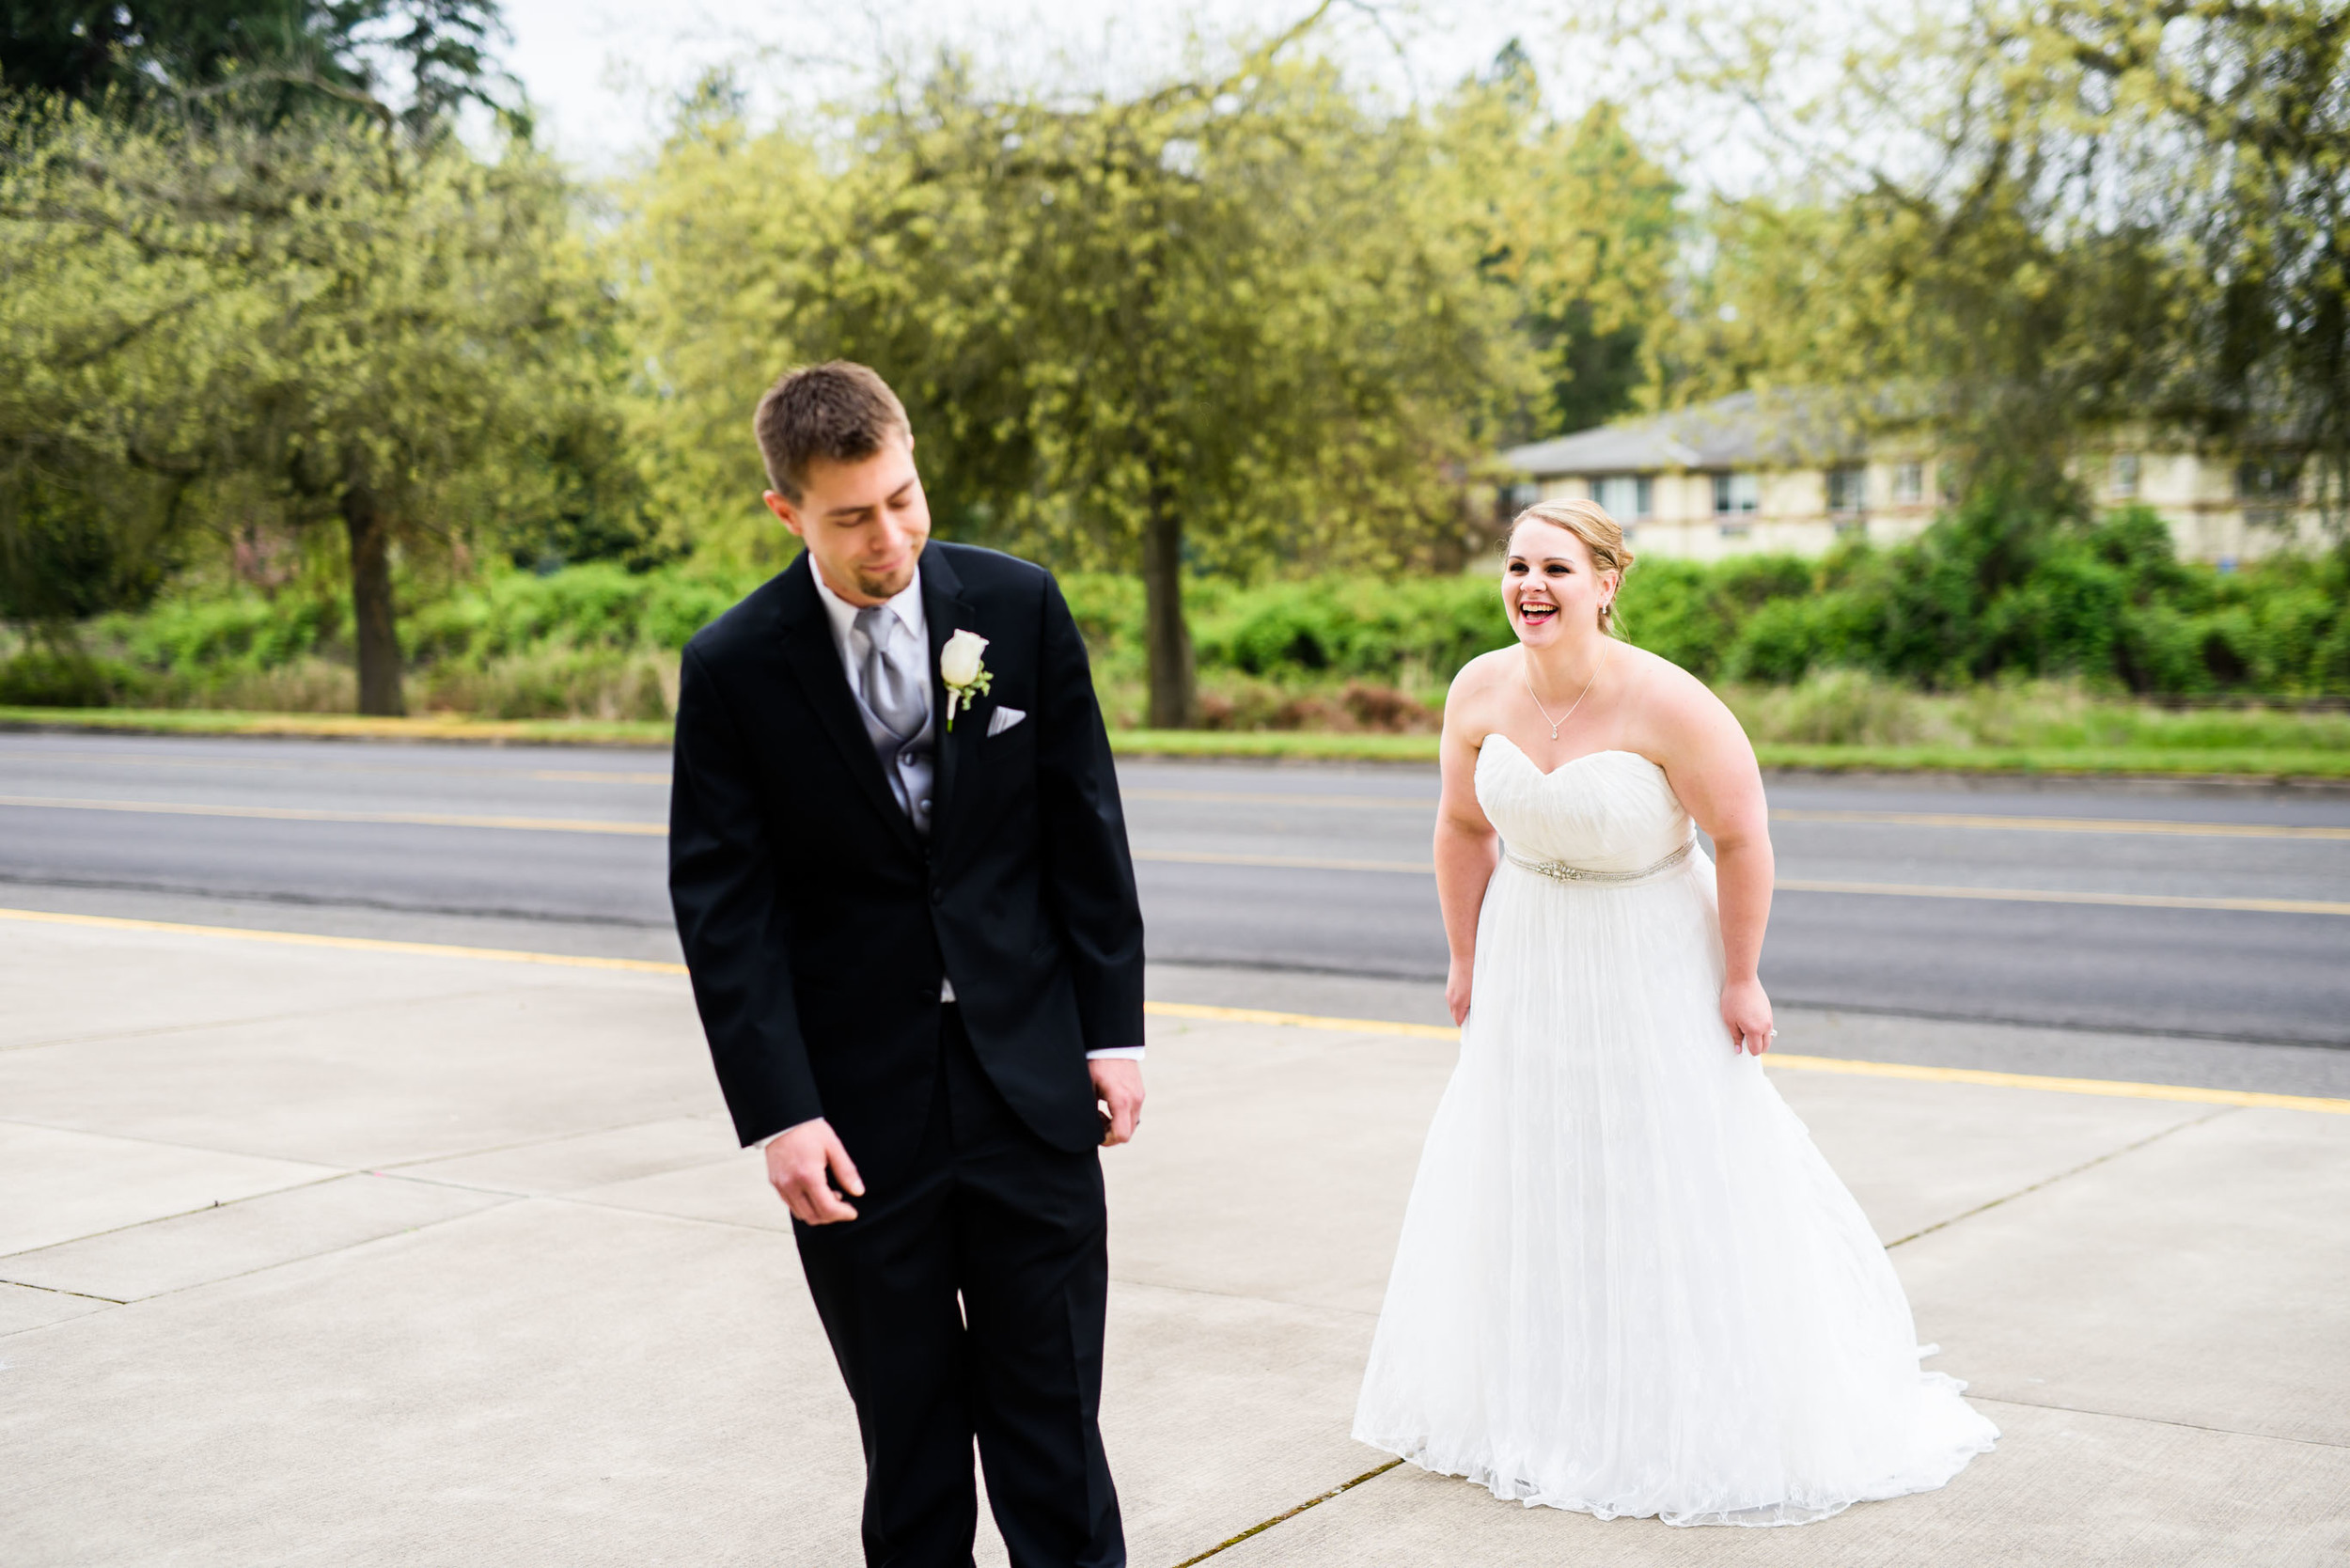 Michael & Melissa10.jpg